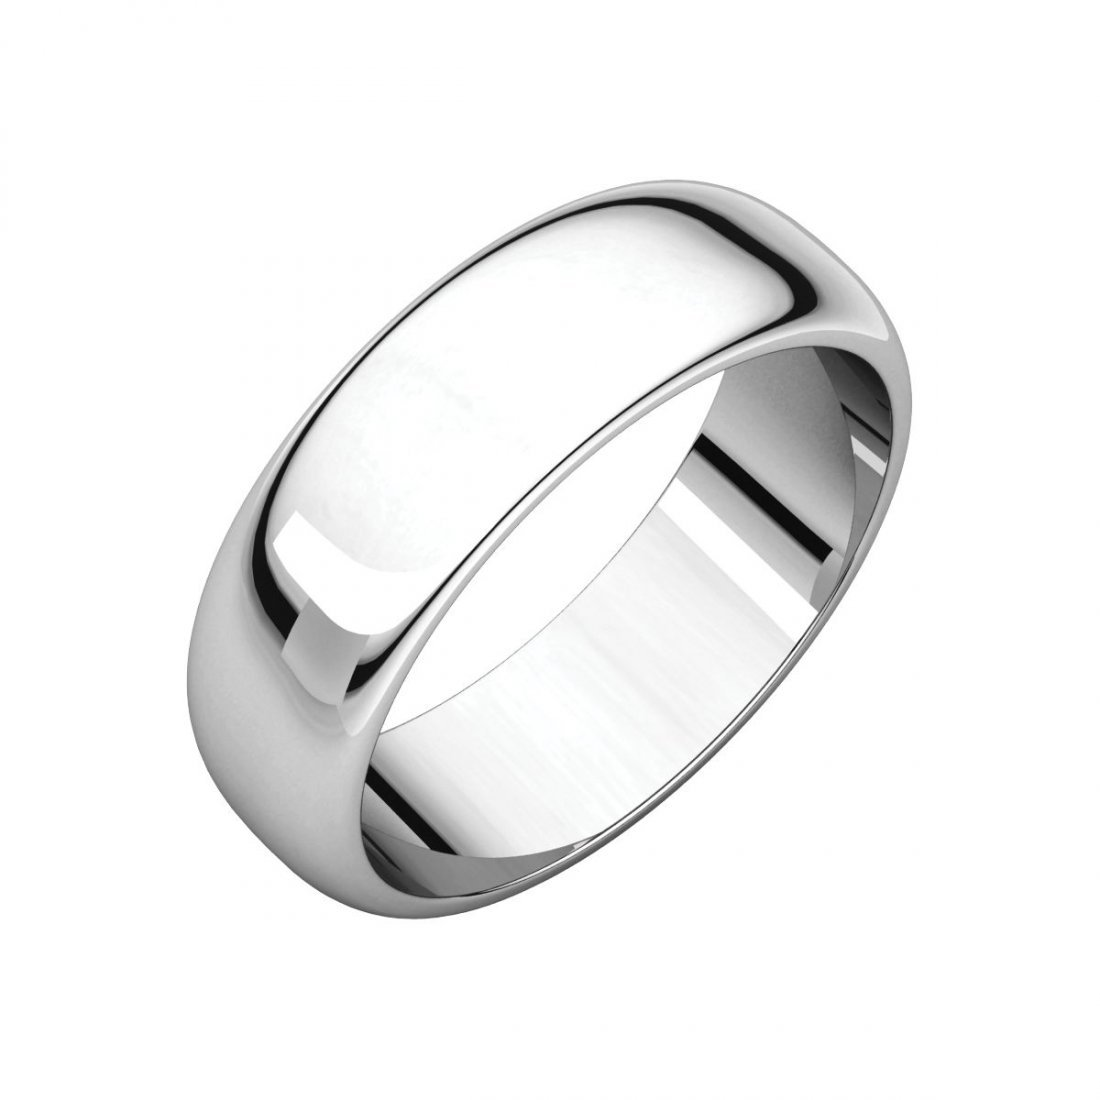 Ring - 14k White Gold 6mm Half Round Band